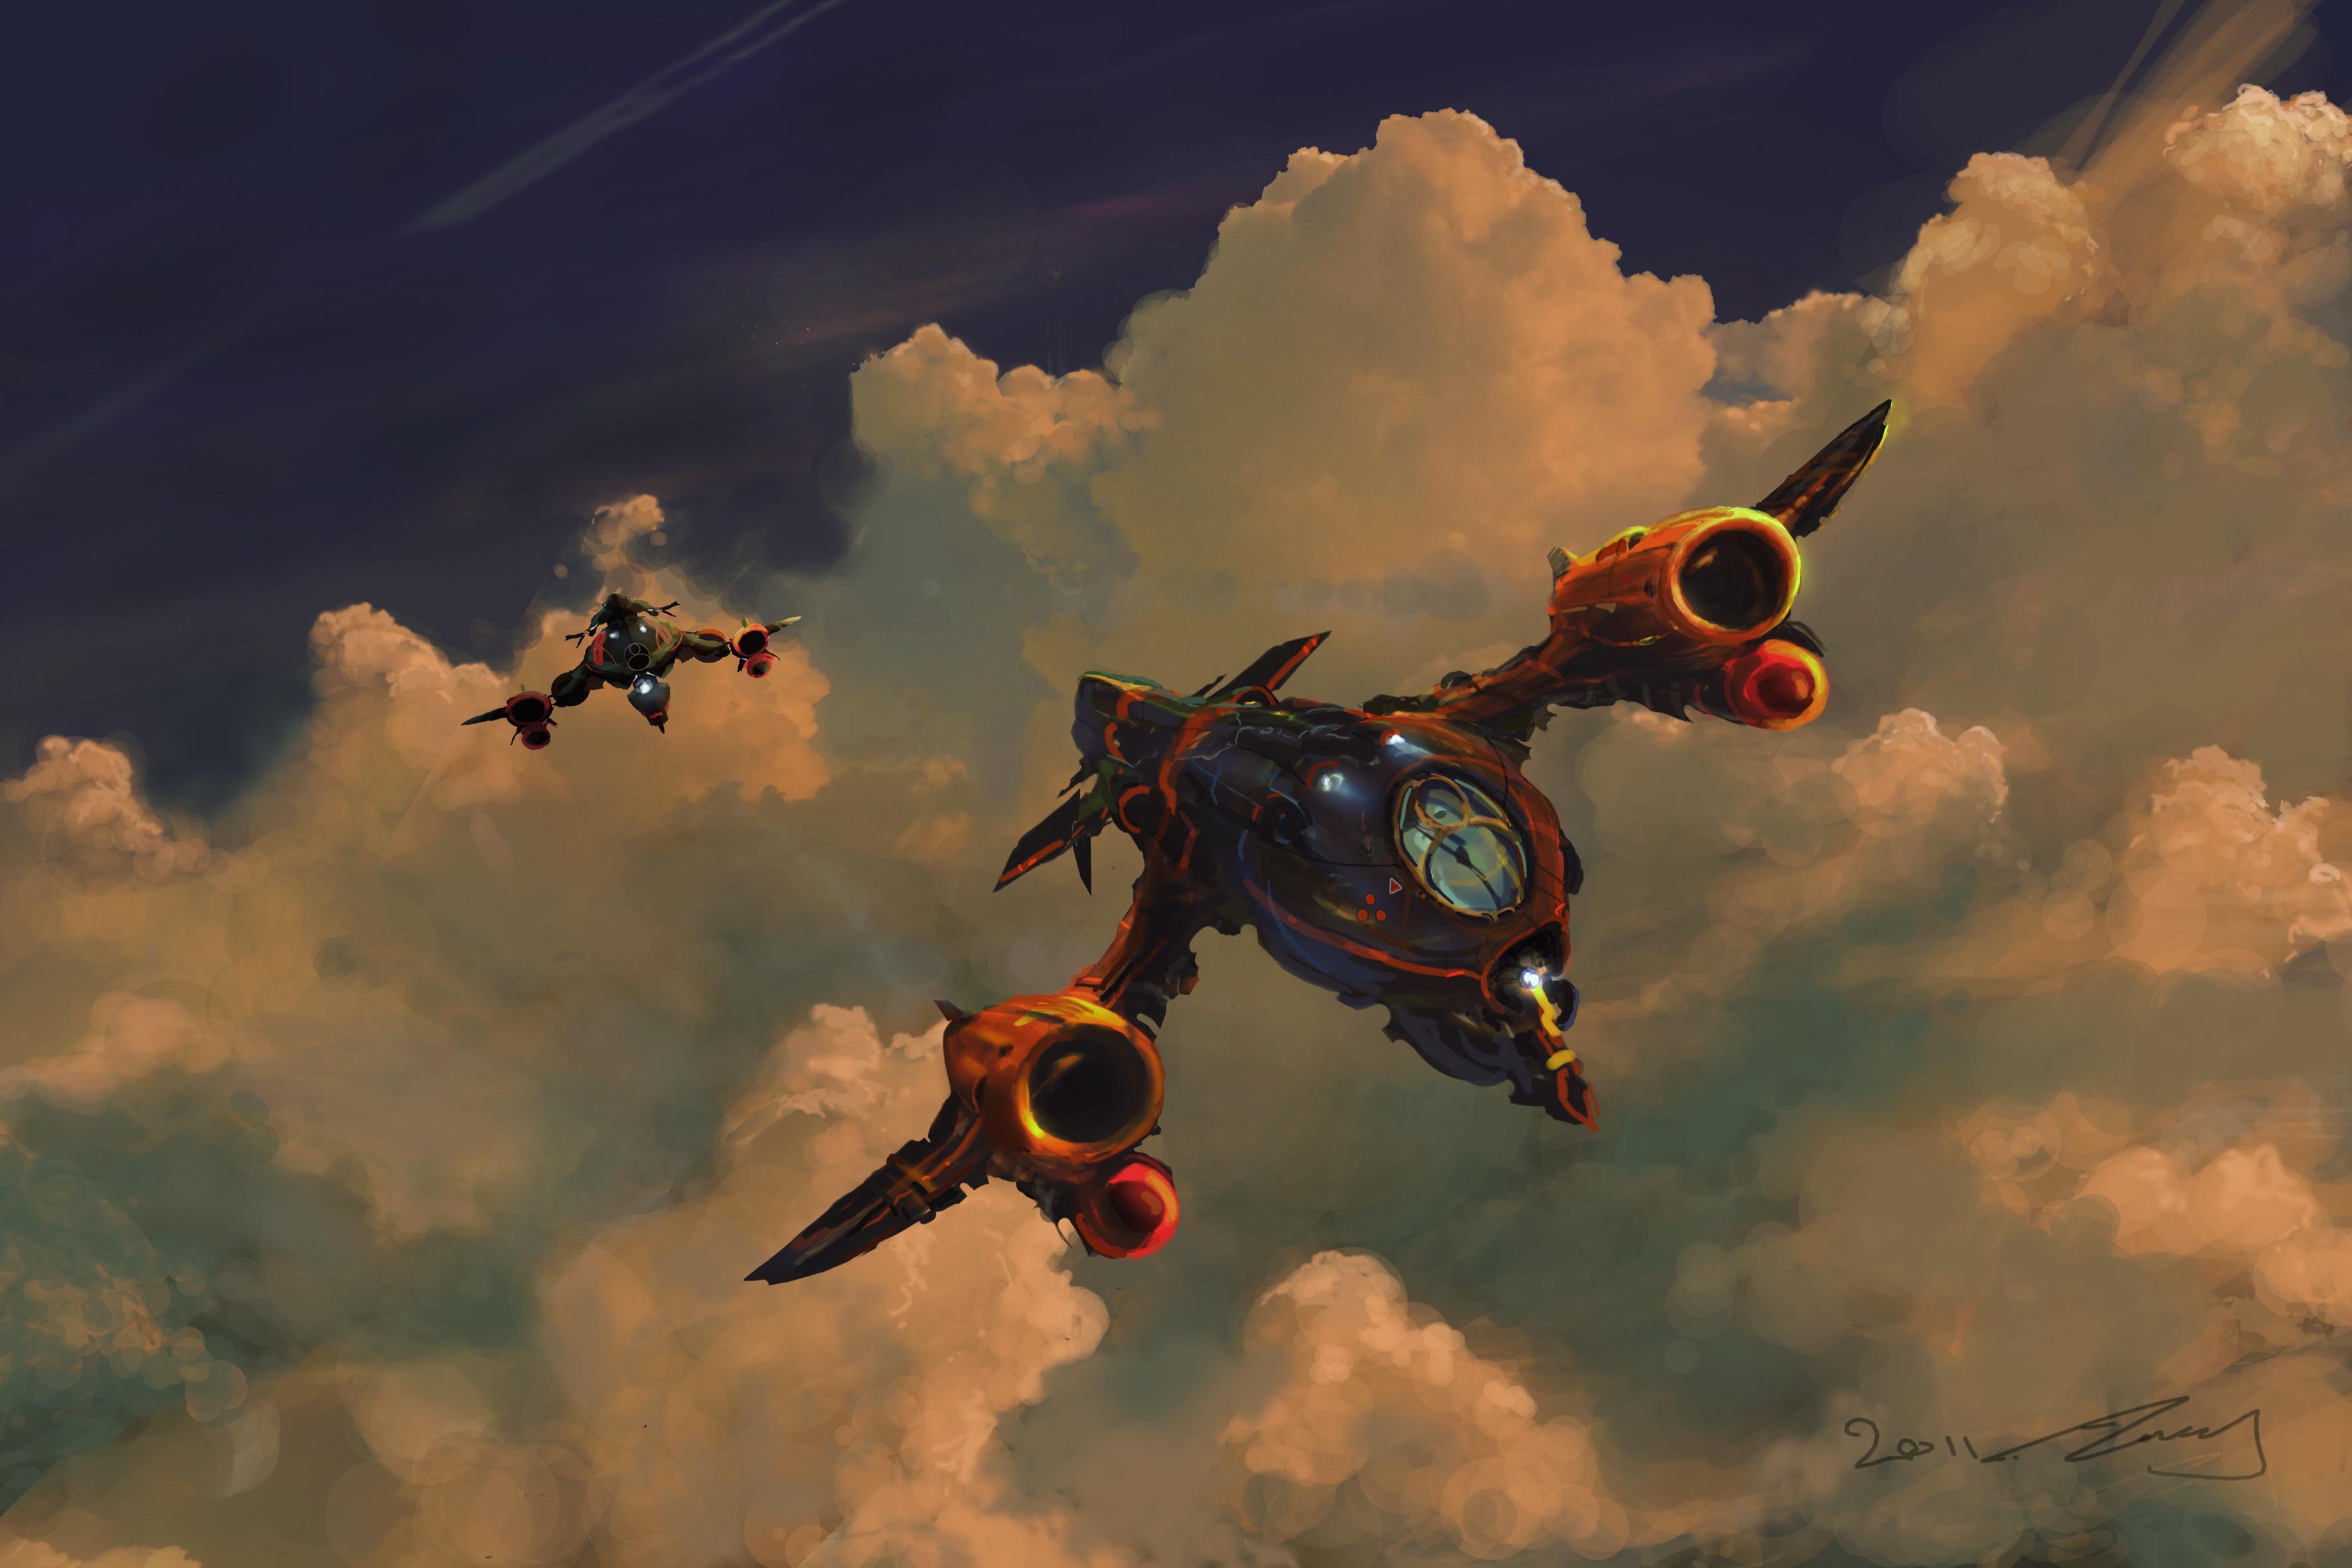 Spaceship hd wallpaper background image 3543x2362 id - Spaceship wallpaper ...